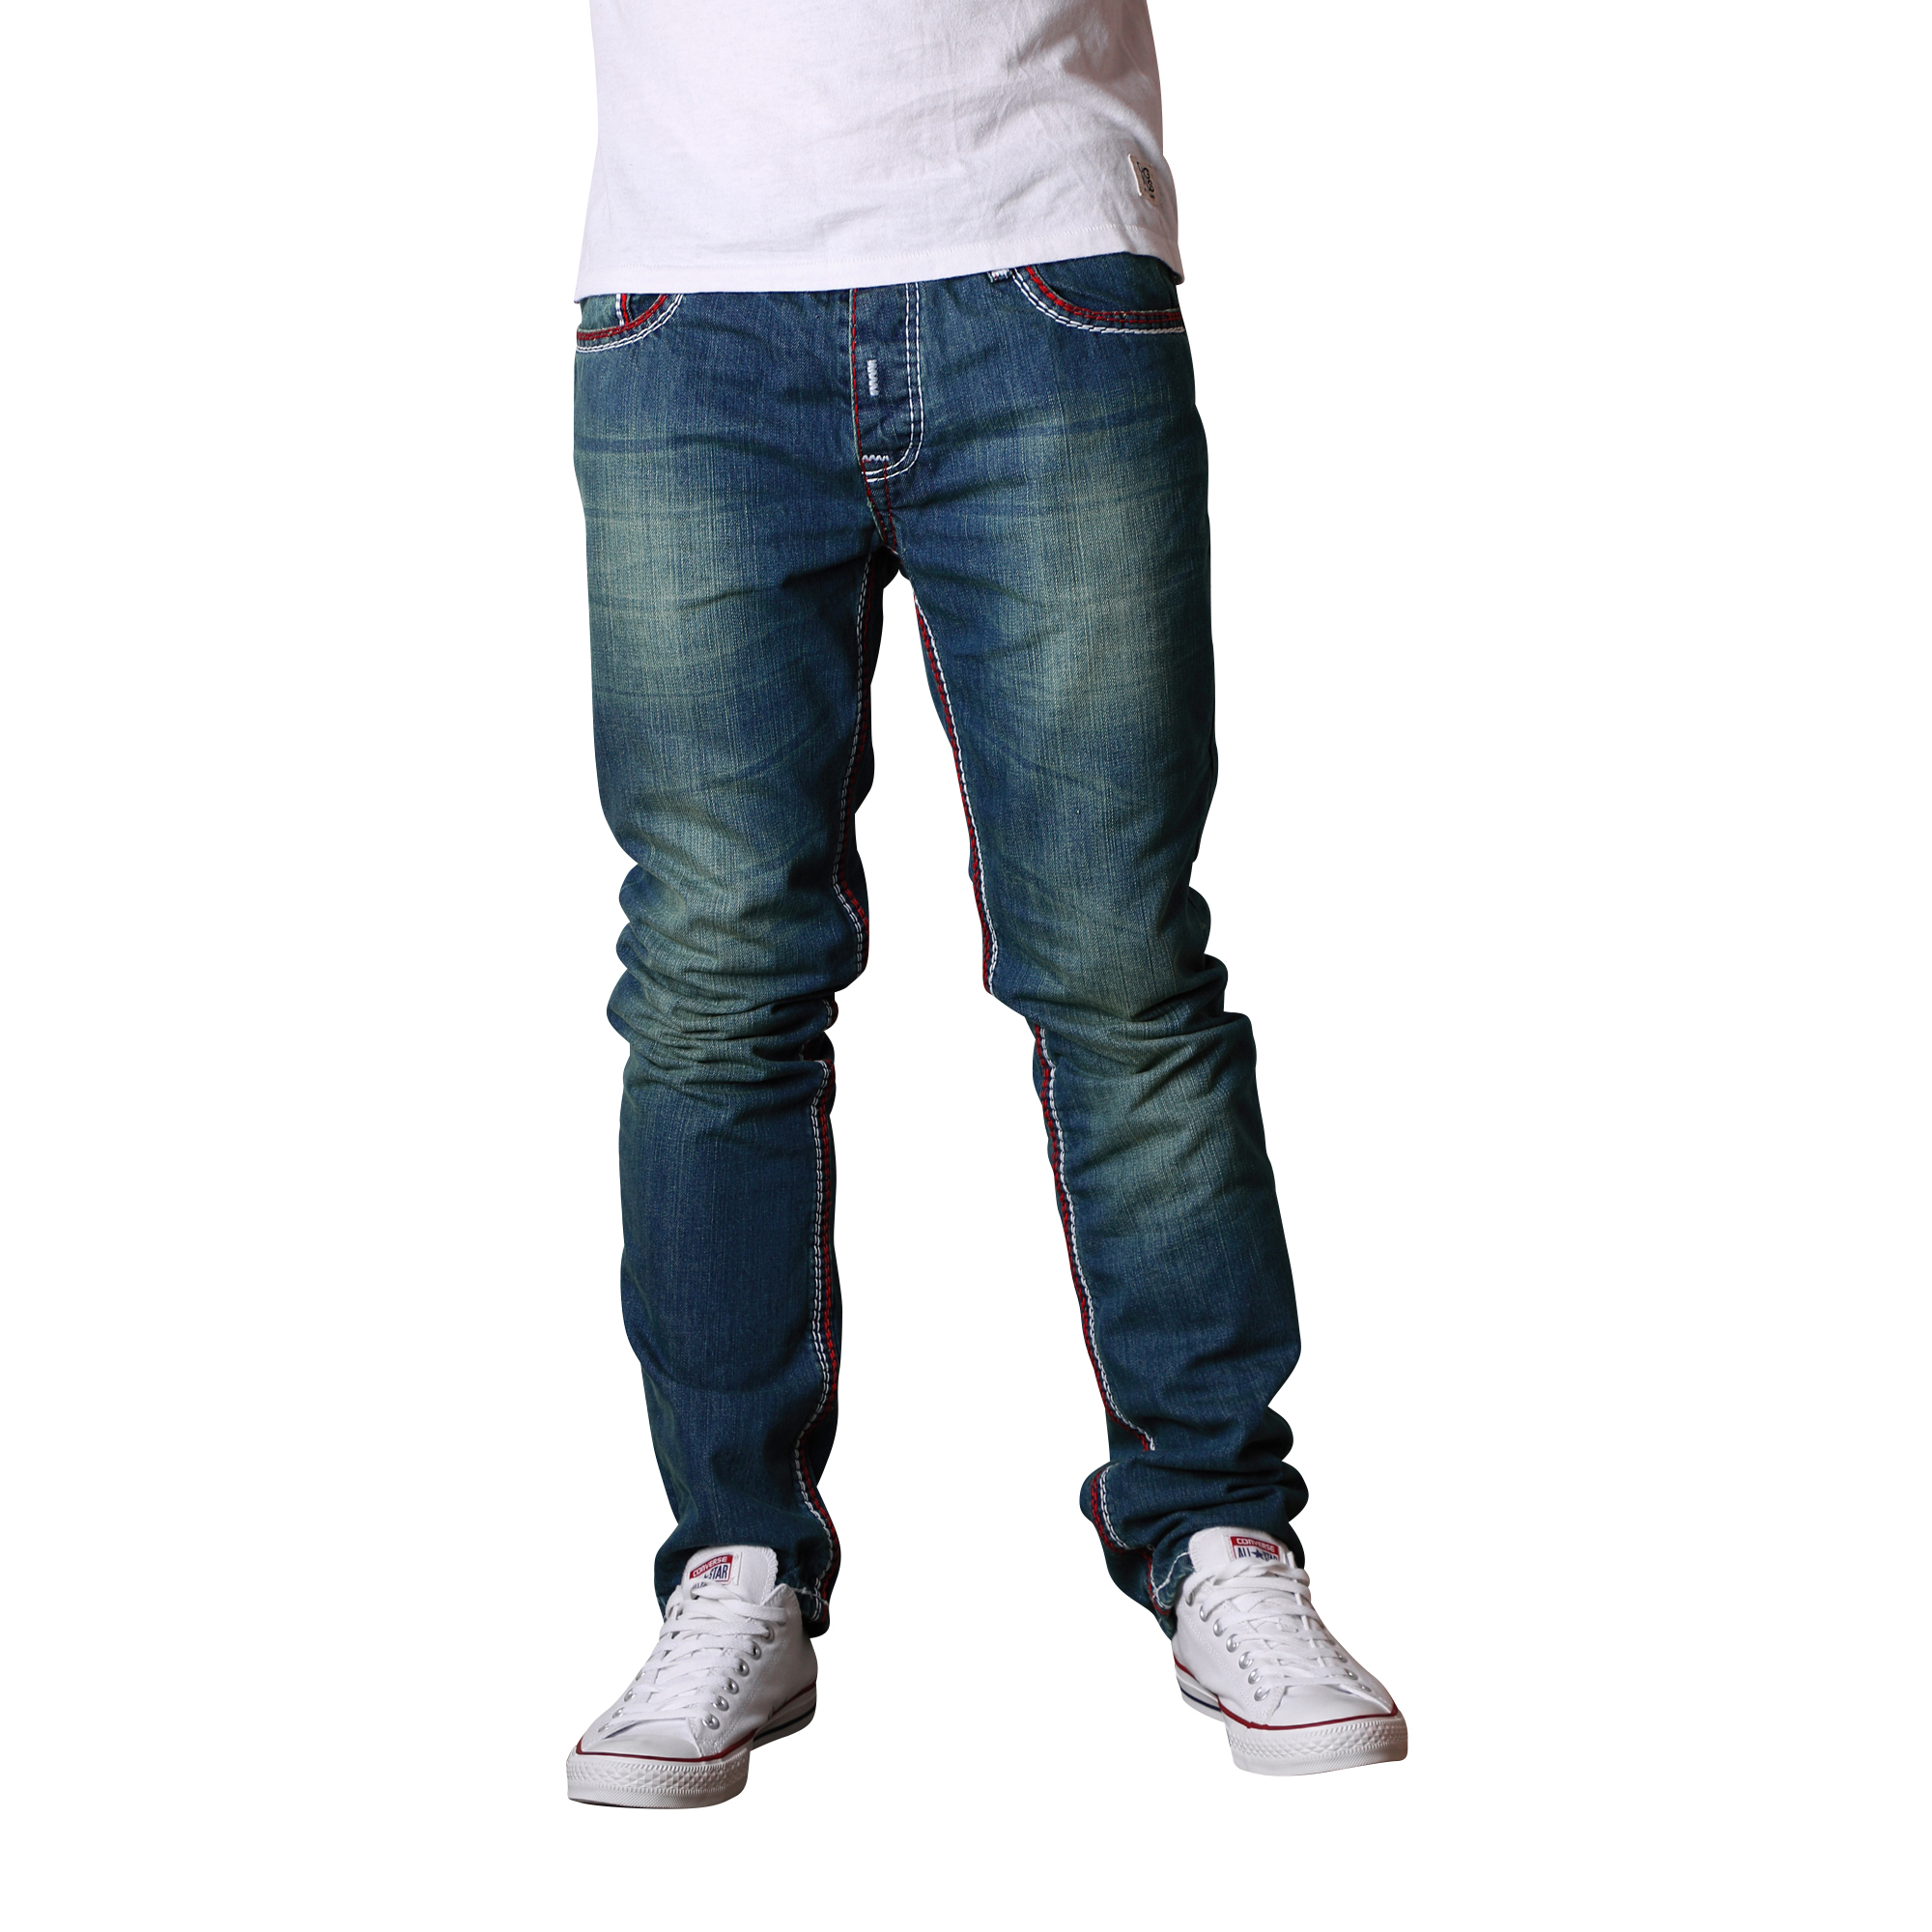 rote jeans herren amica herren jeans hose dicke naht. Black Bedroom Furniture Sets. Home Design Ideas